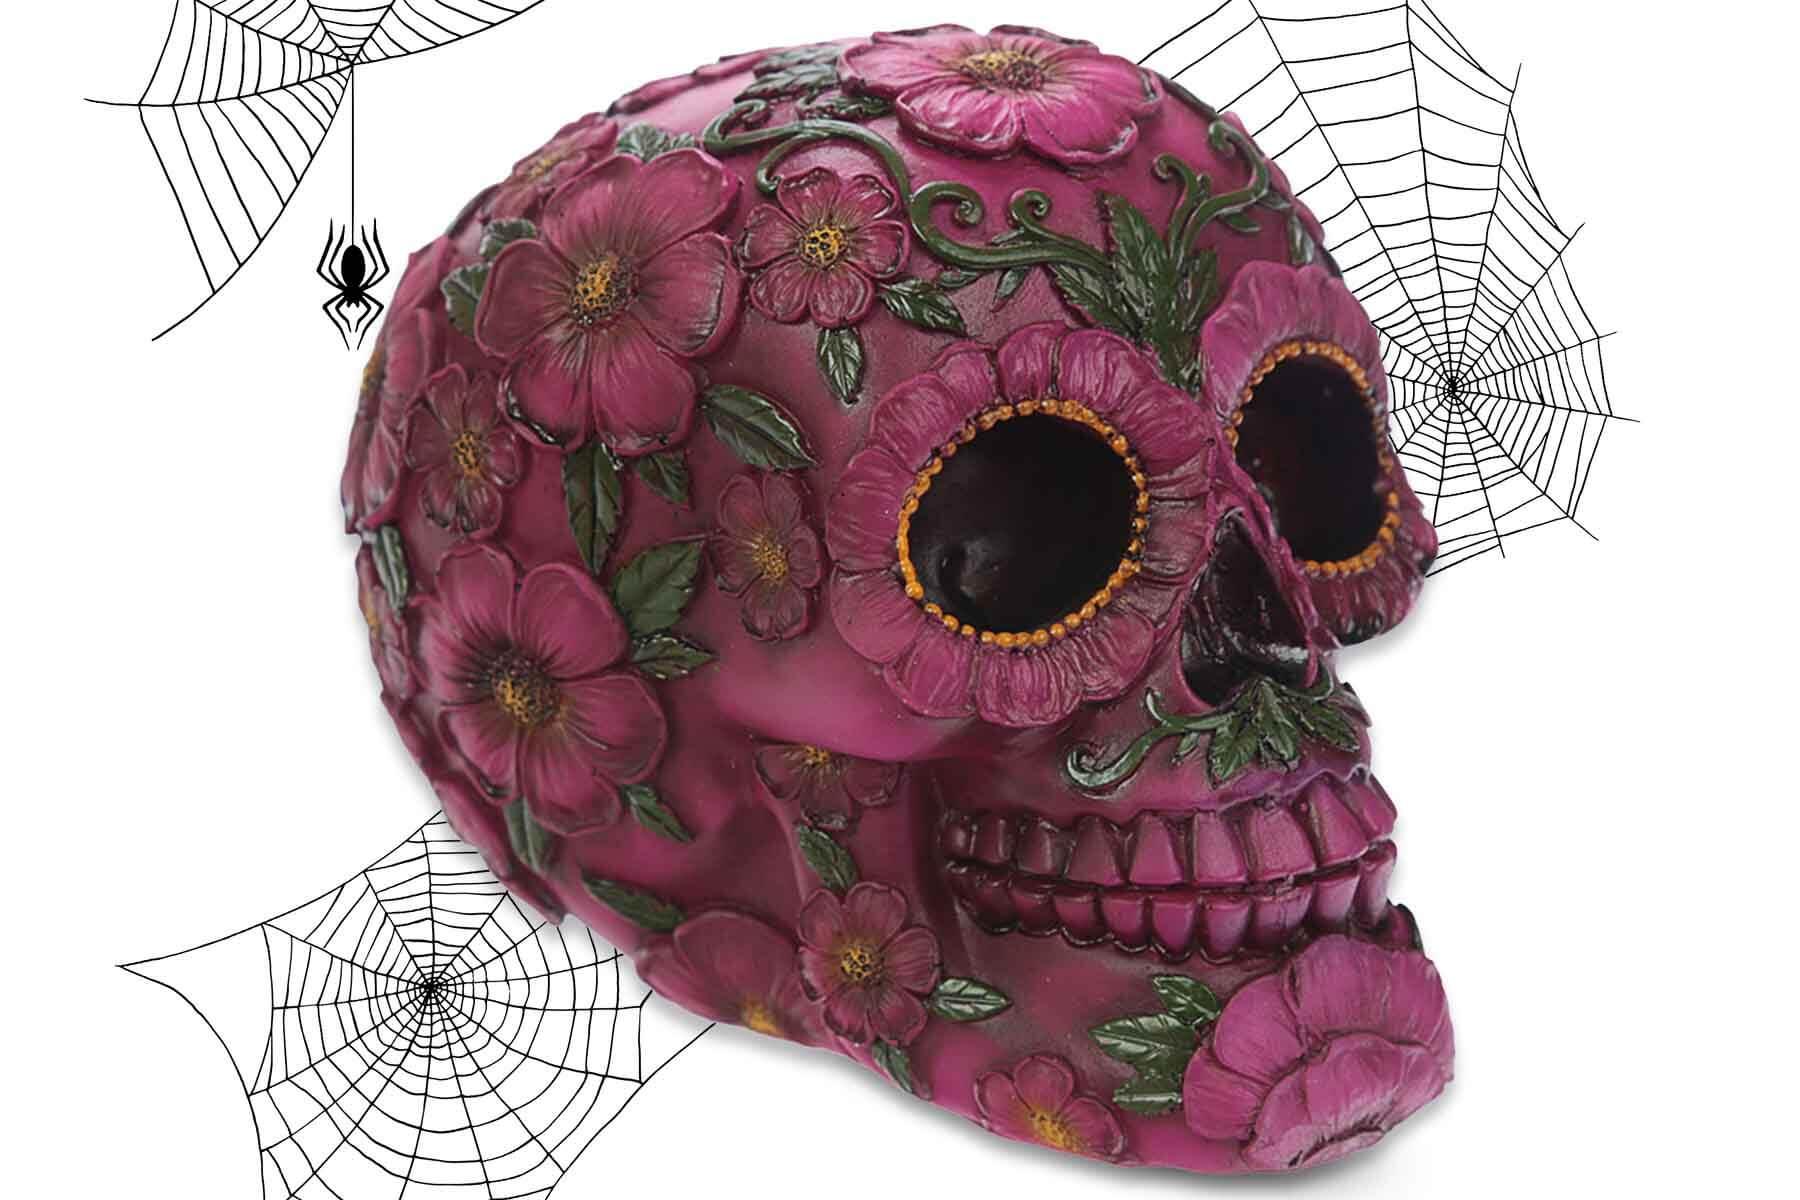 Totenkopf Totenschädel Flower Power Deko Skull Flower Power Sonnenblume